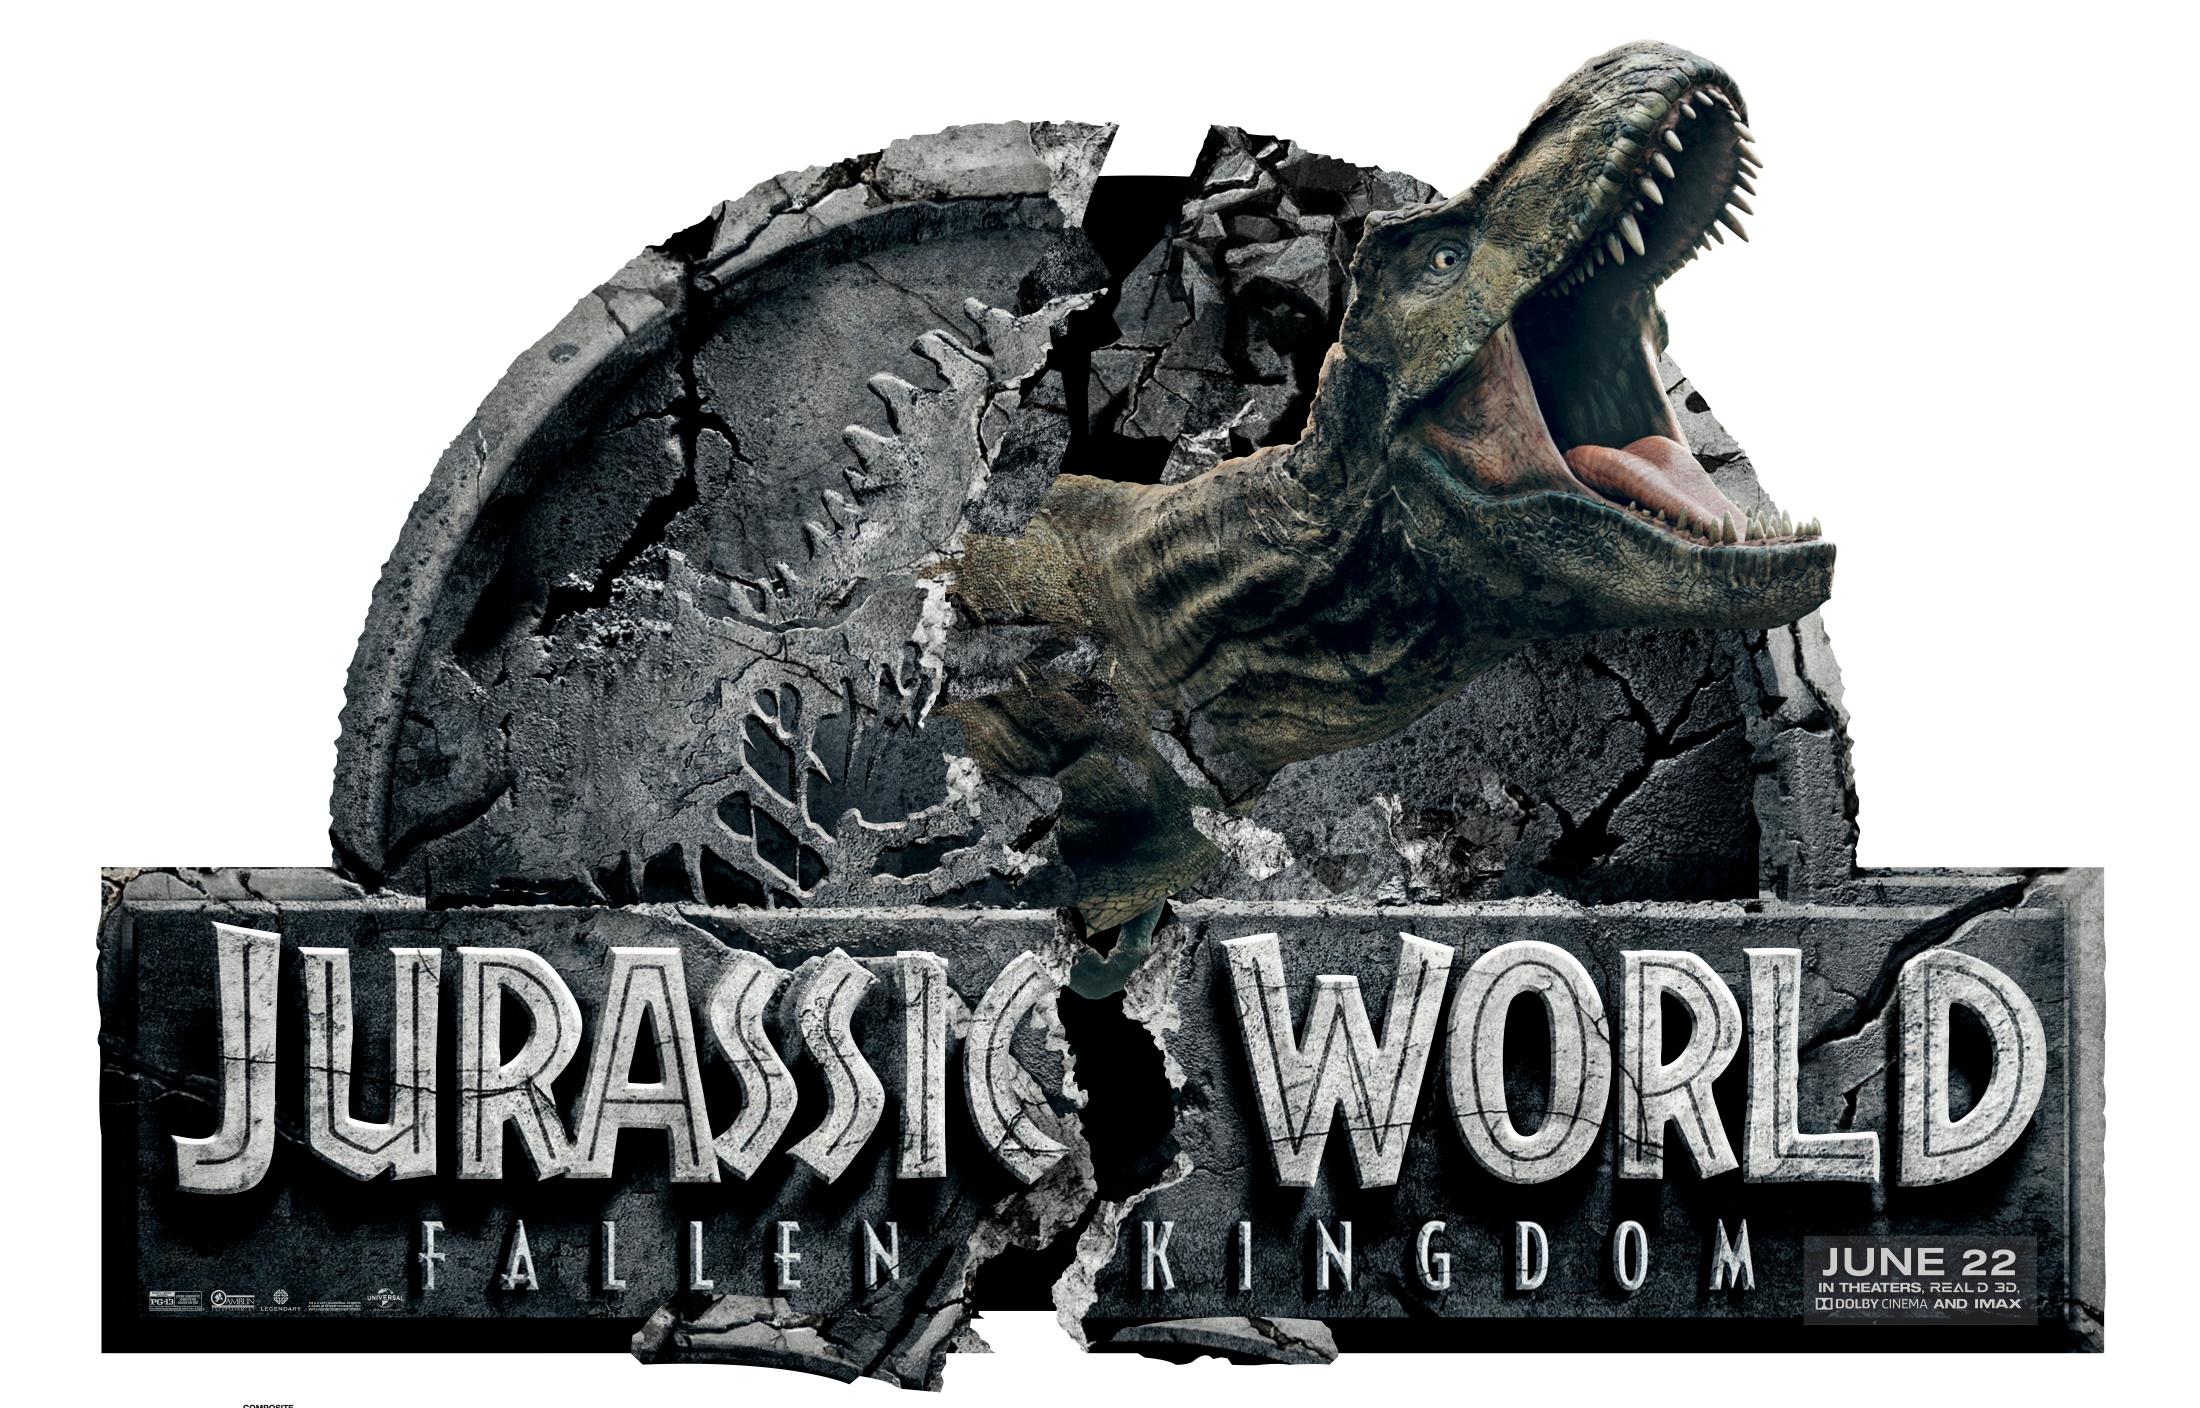 Thumbnail for Jurassic World Standee